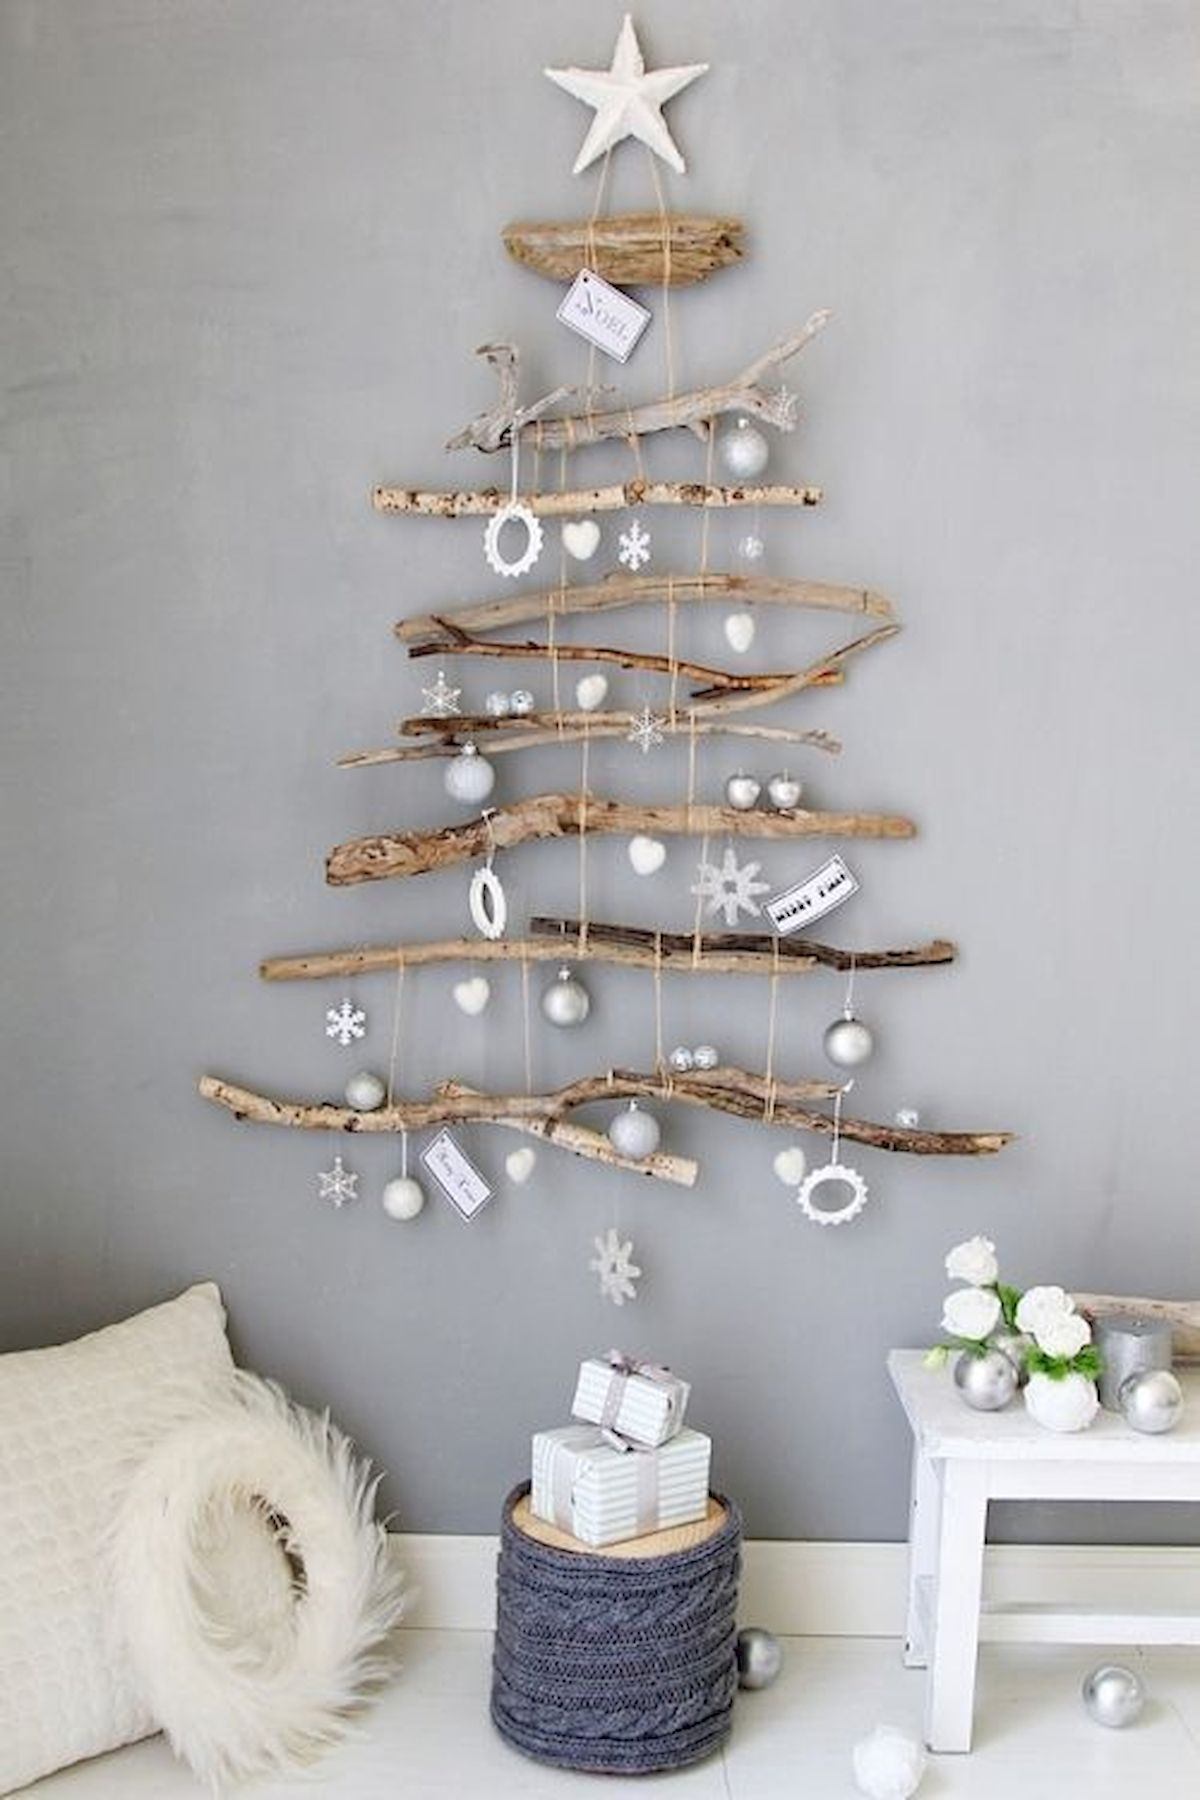 Cool 40 Stunning Rustic Christmas Decor Ideas Httpscoachdecorcom40